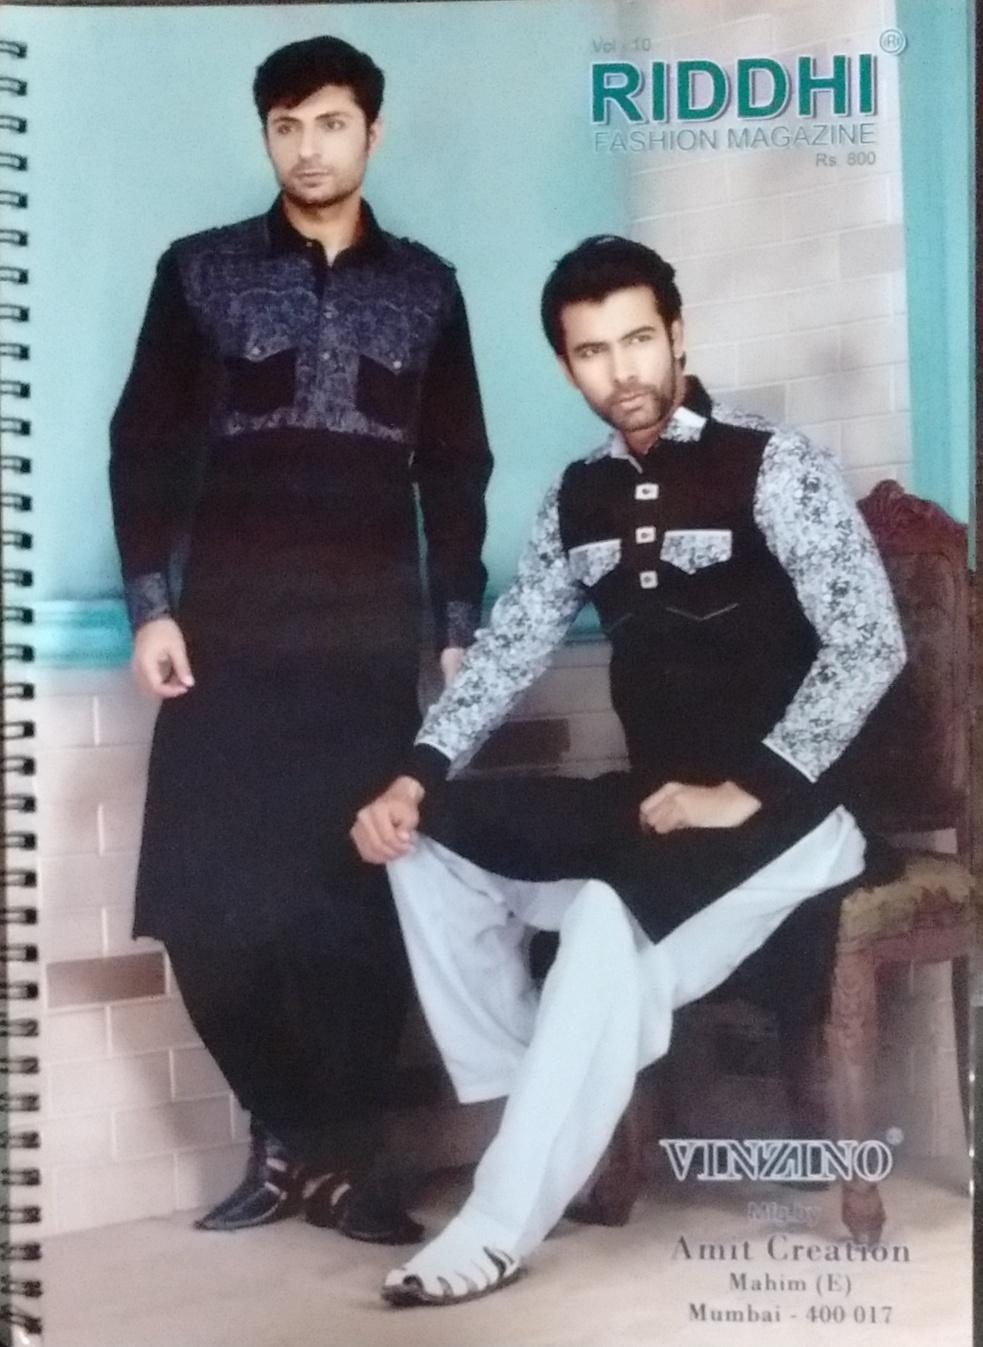 Riddhi Fashion Magazine Vol. 10